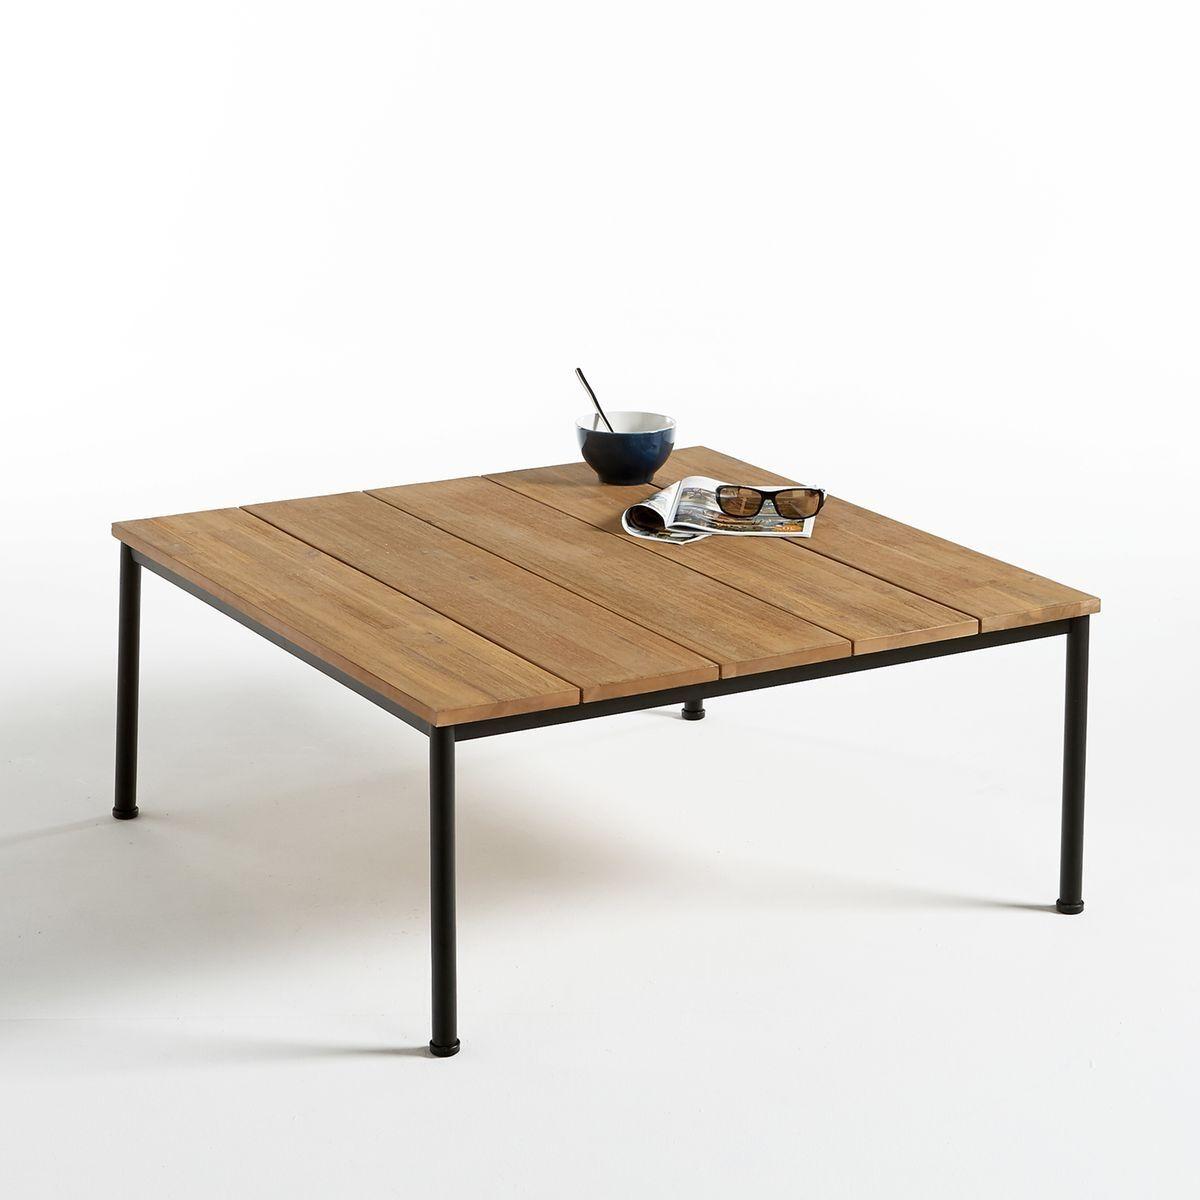 La Redoute Table basse de jardin, HIBA - LA REDOUTE INTERIEURS